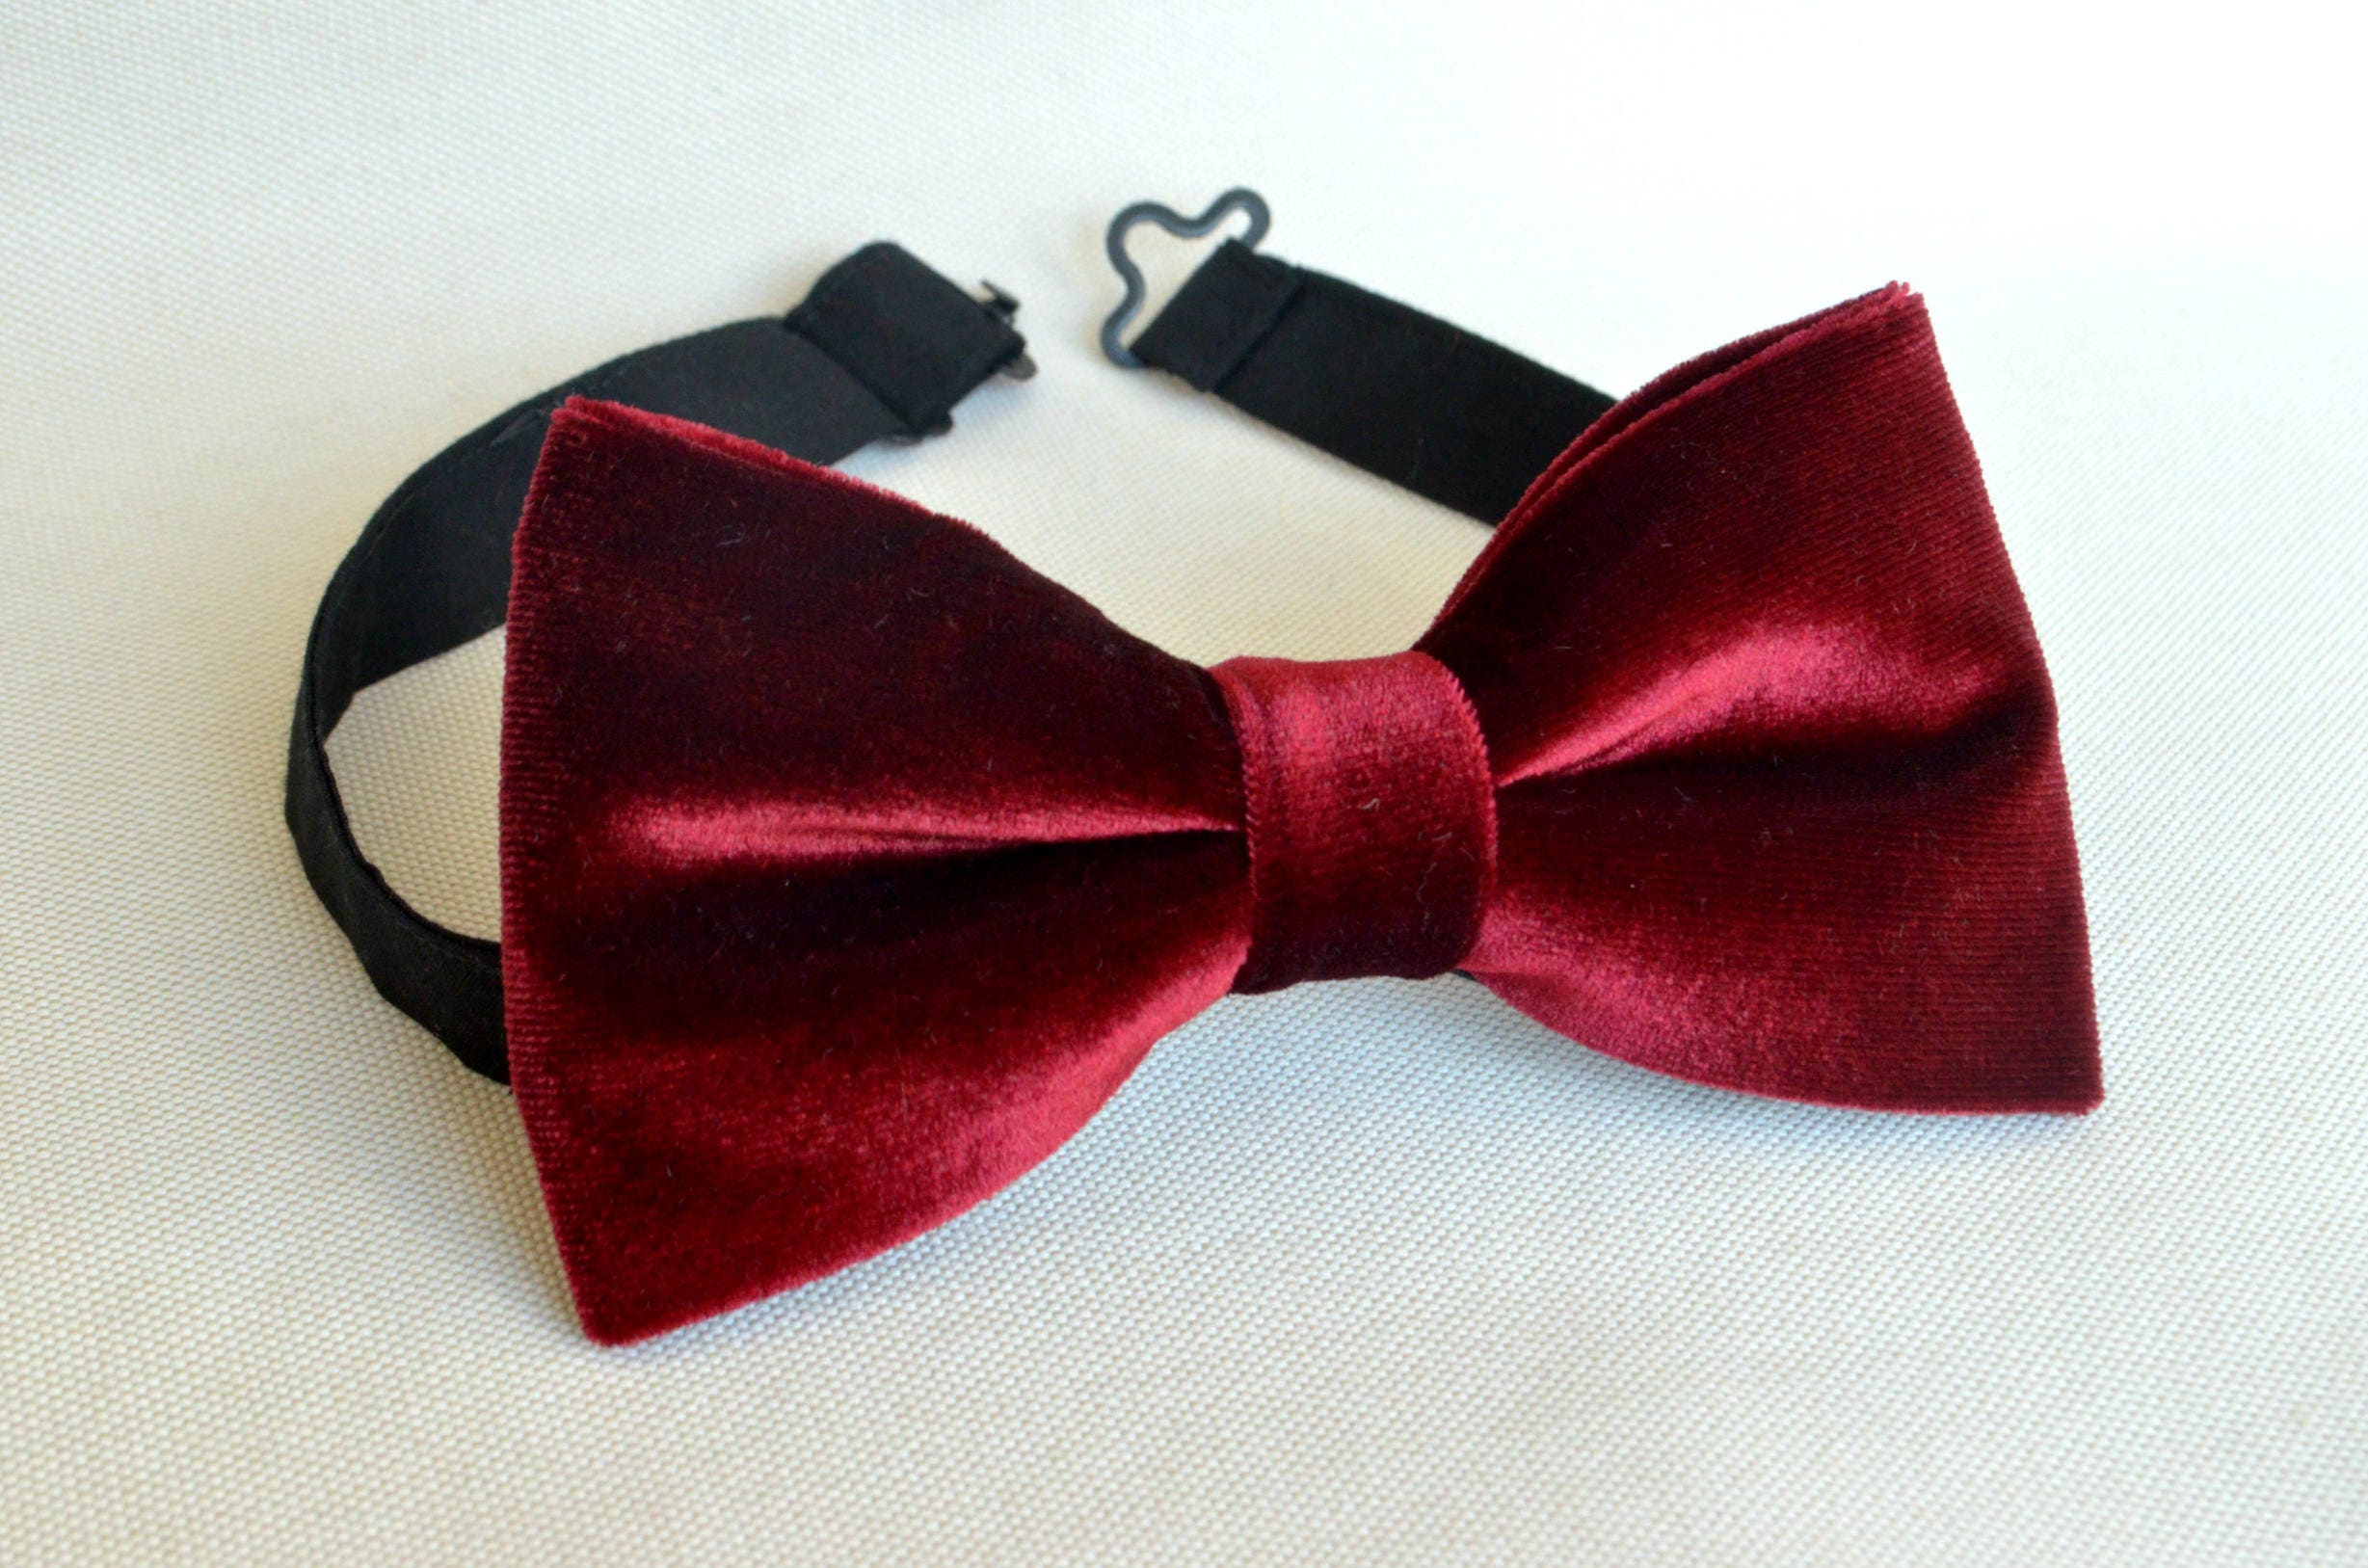 Burgundy velvet bow tie maroon bow ties men\'s bow tie   Etsy